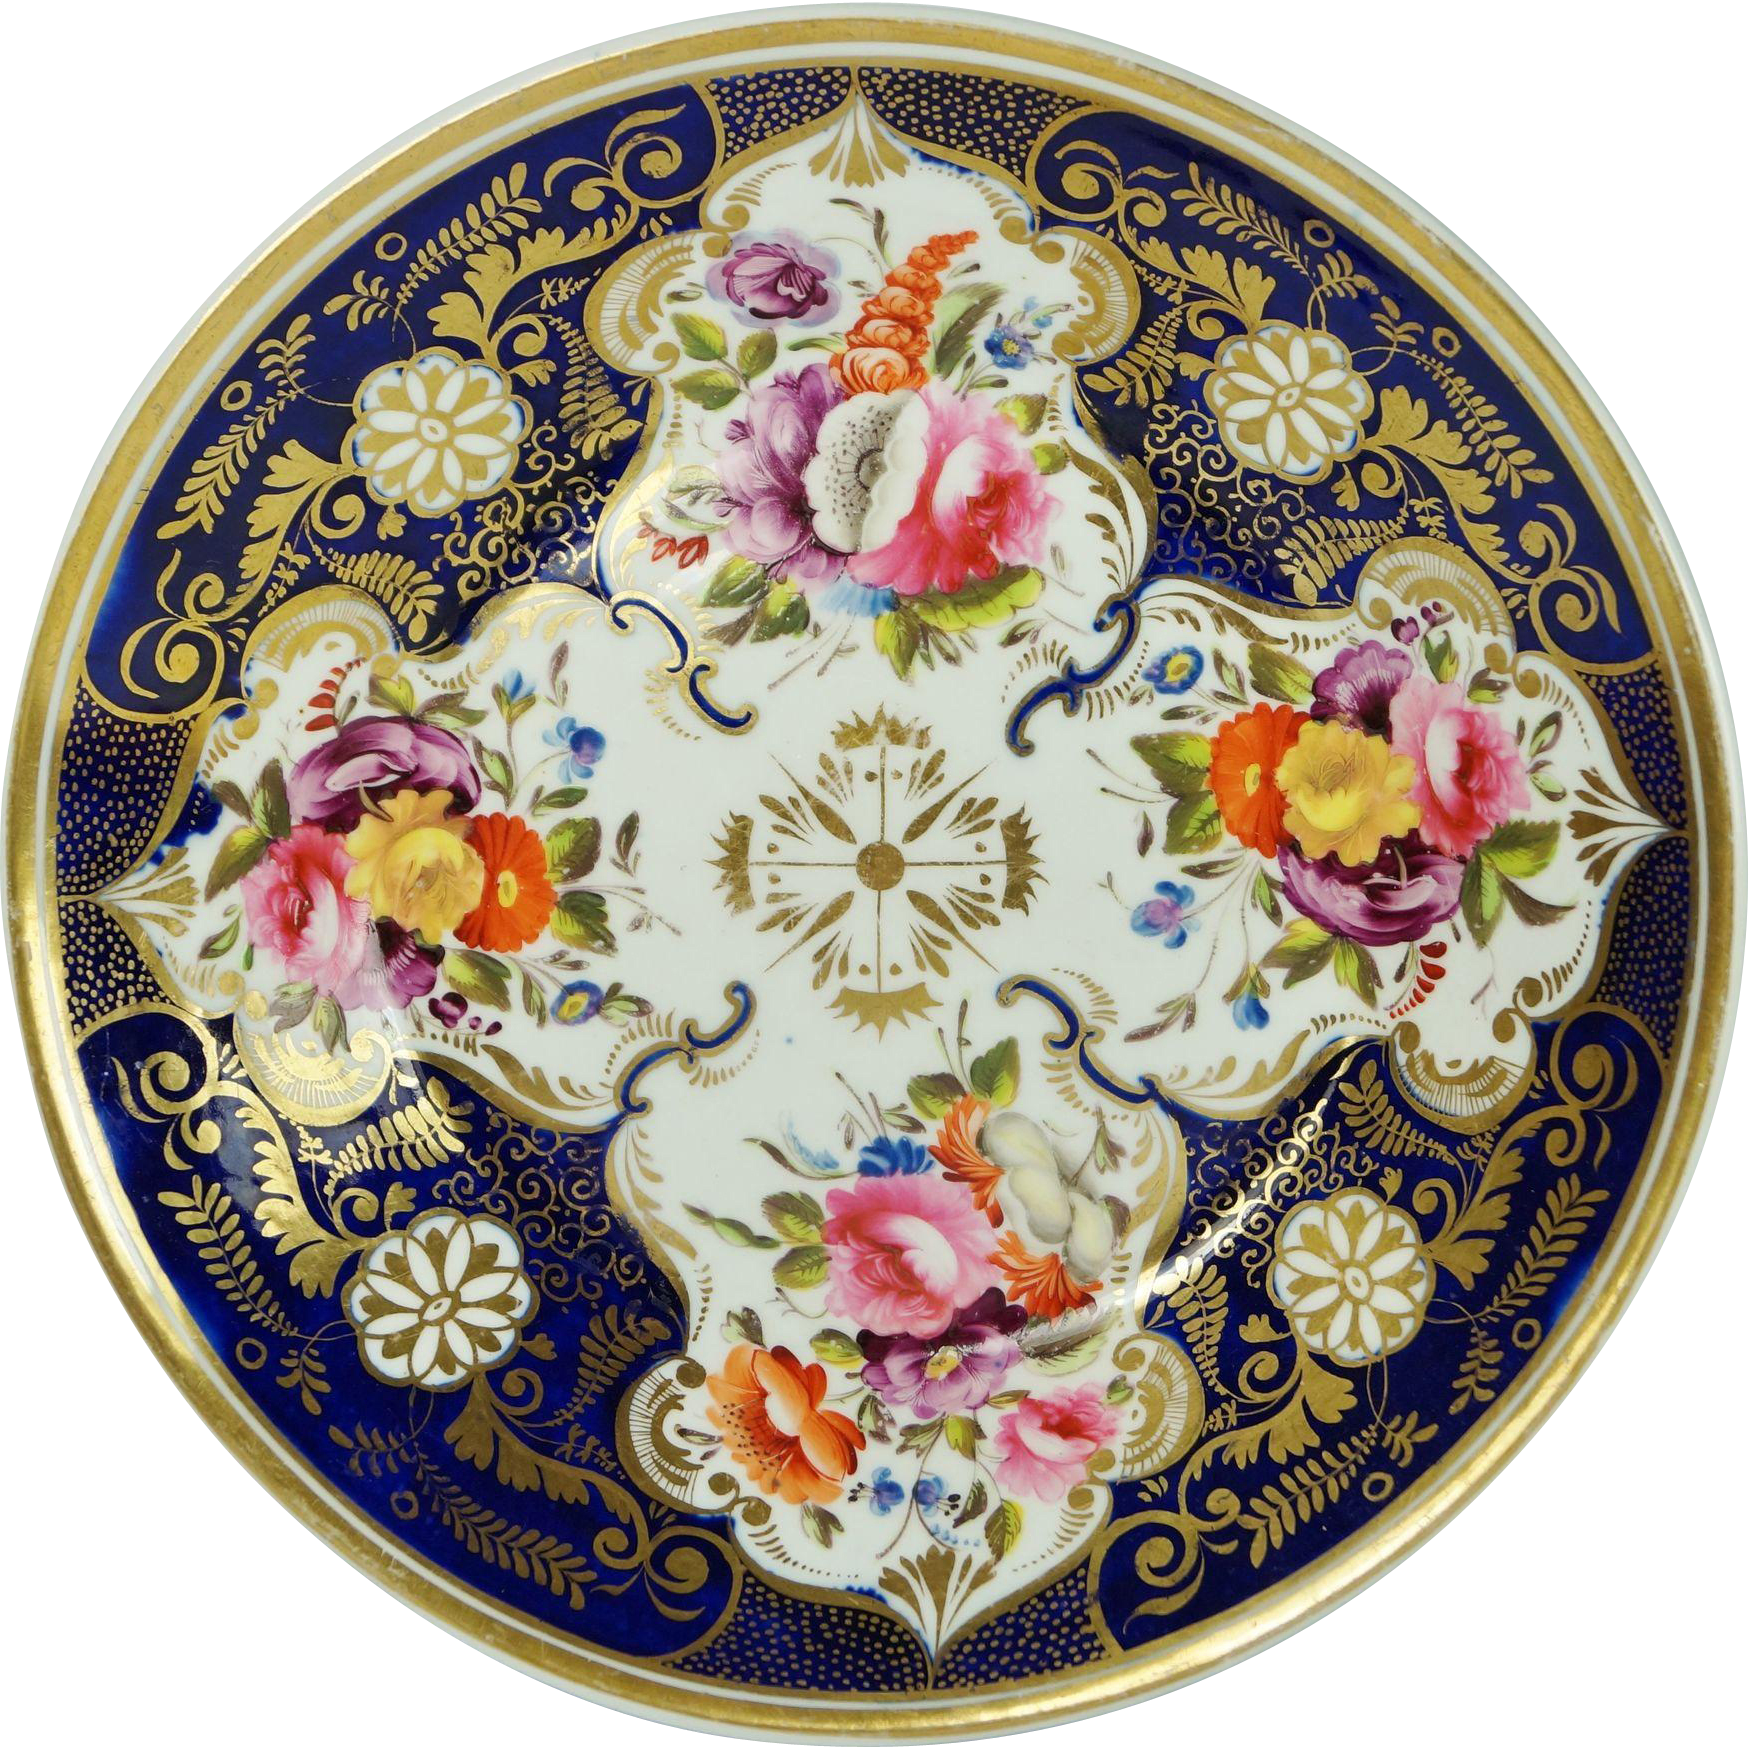 Antique Early Coalport Porcelain Desert Dish Cobalt Blue Florals English Circa 1820